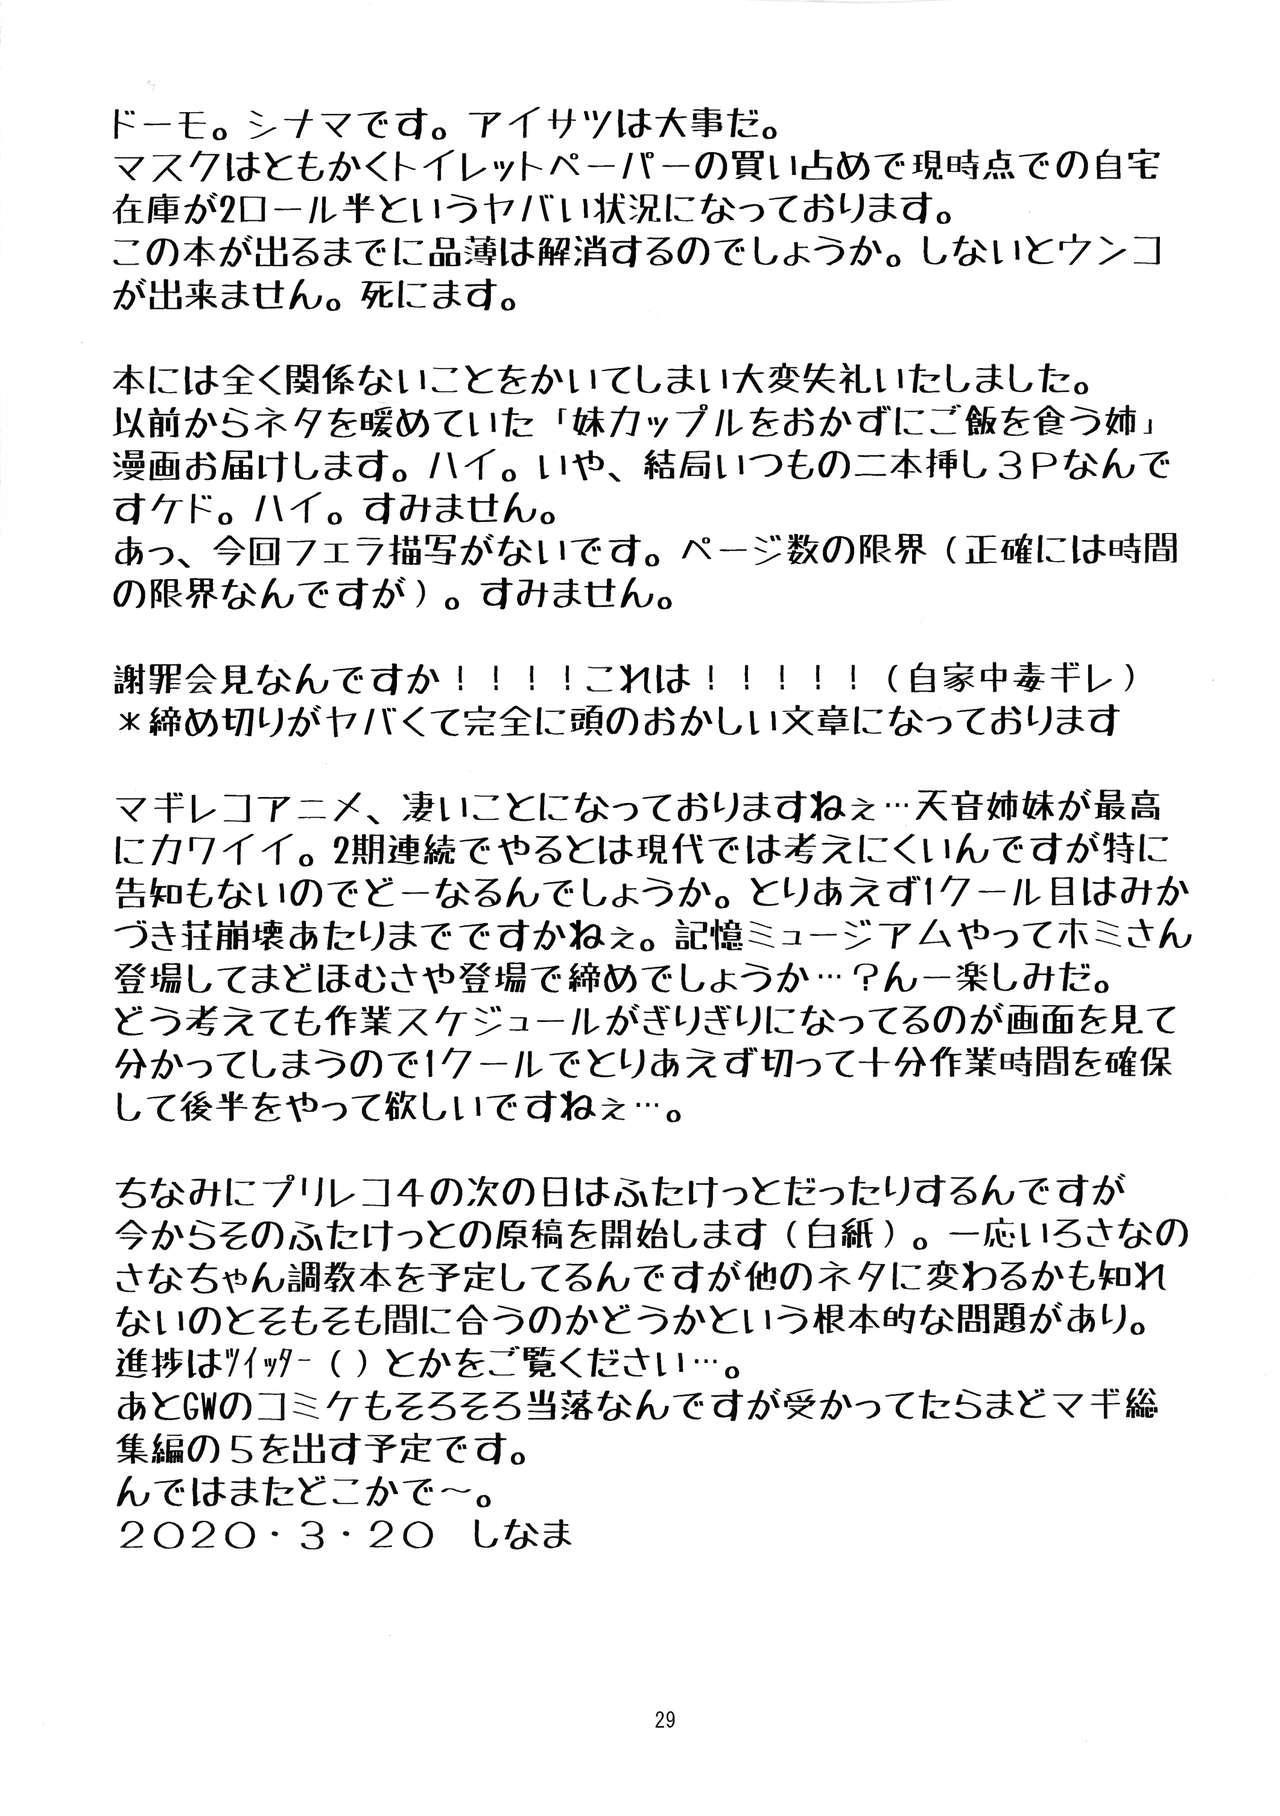 Yusayusa Anekano Sandwich 27